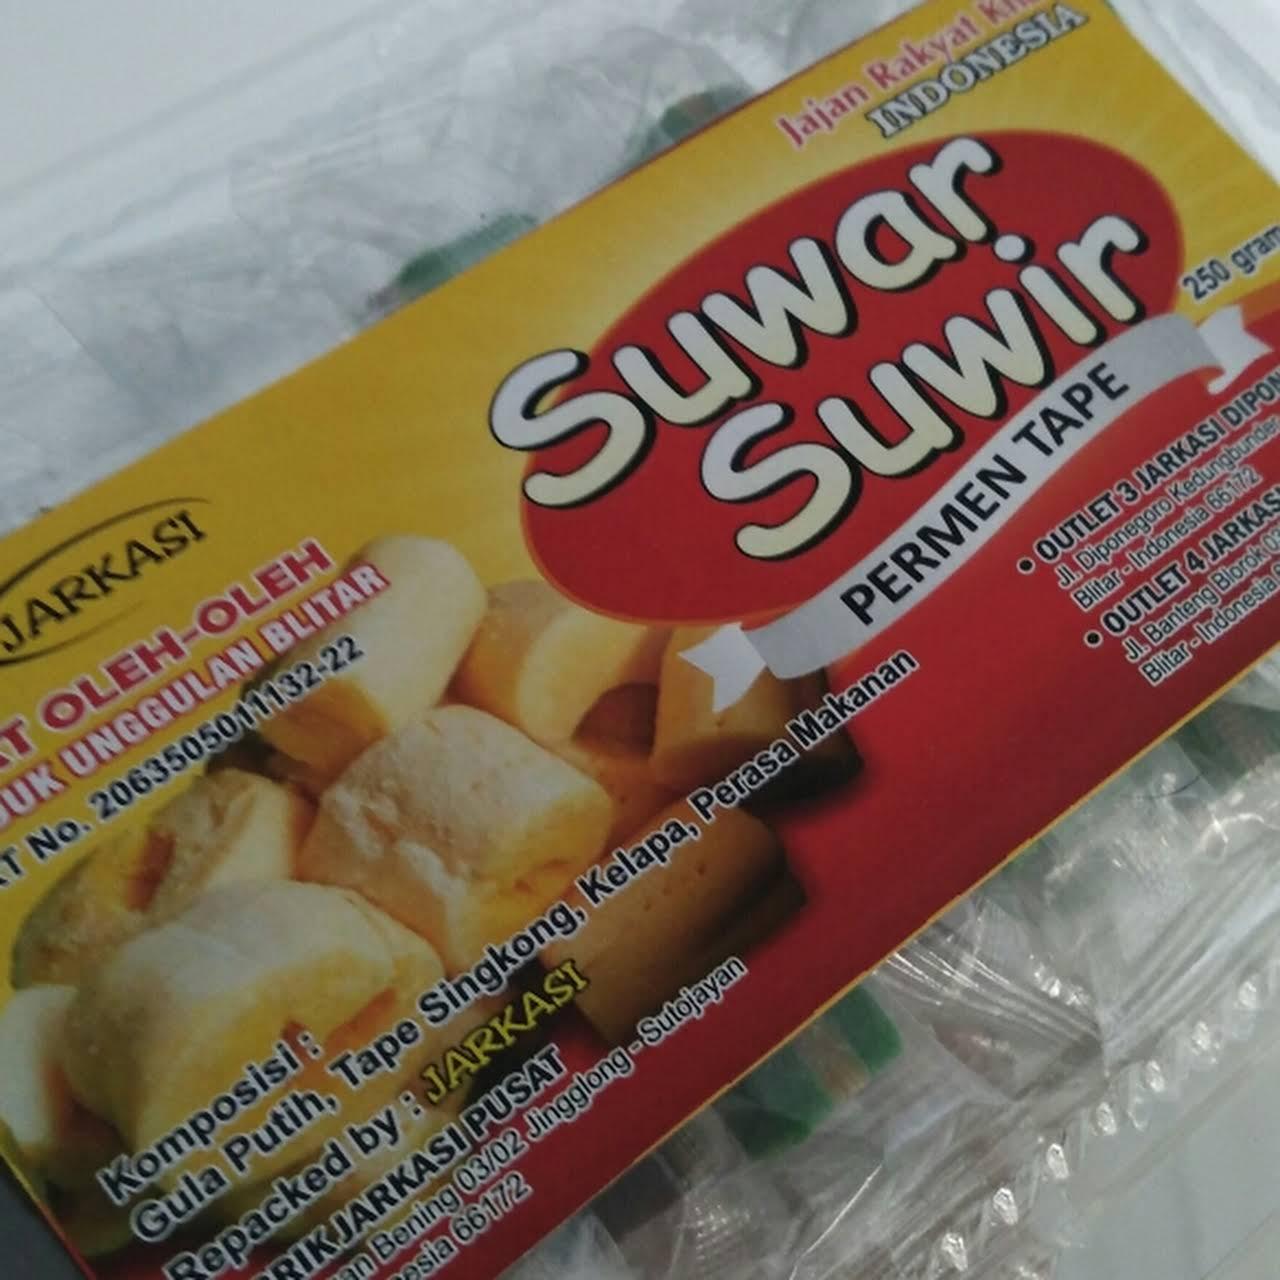 Outlet 1 Jarkasi Jenang Uha Rich Milk Candy Permen Jepang Rasa Susu 103 Gr Spec Dan